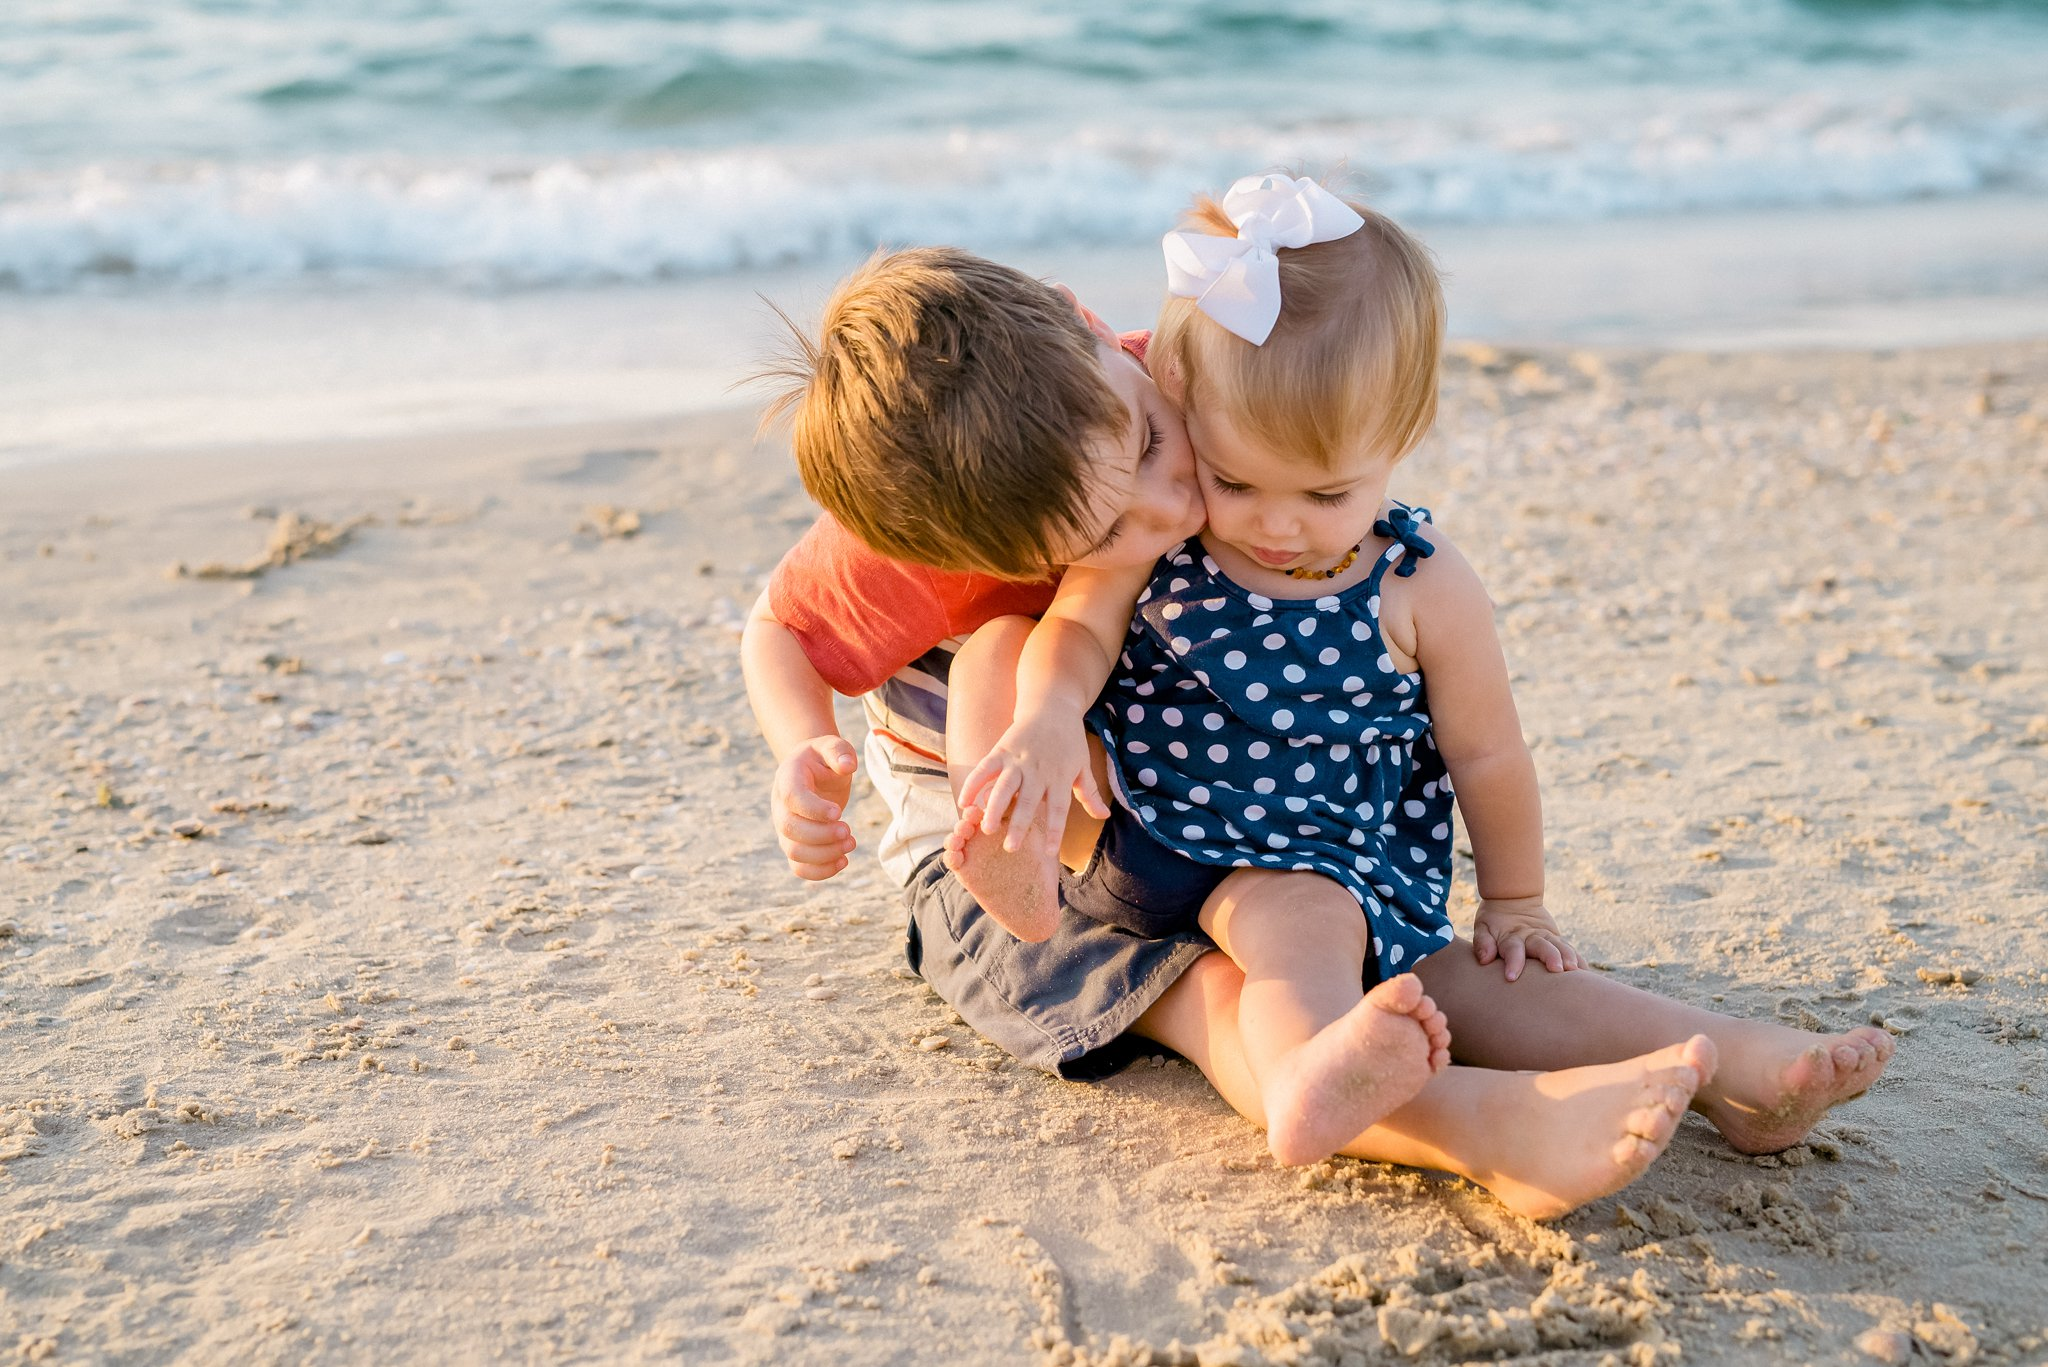 Caesarea-israel-beach-family-session-kate-giryes-photography-25_WEB.jpg